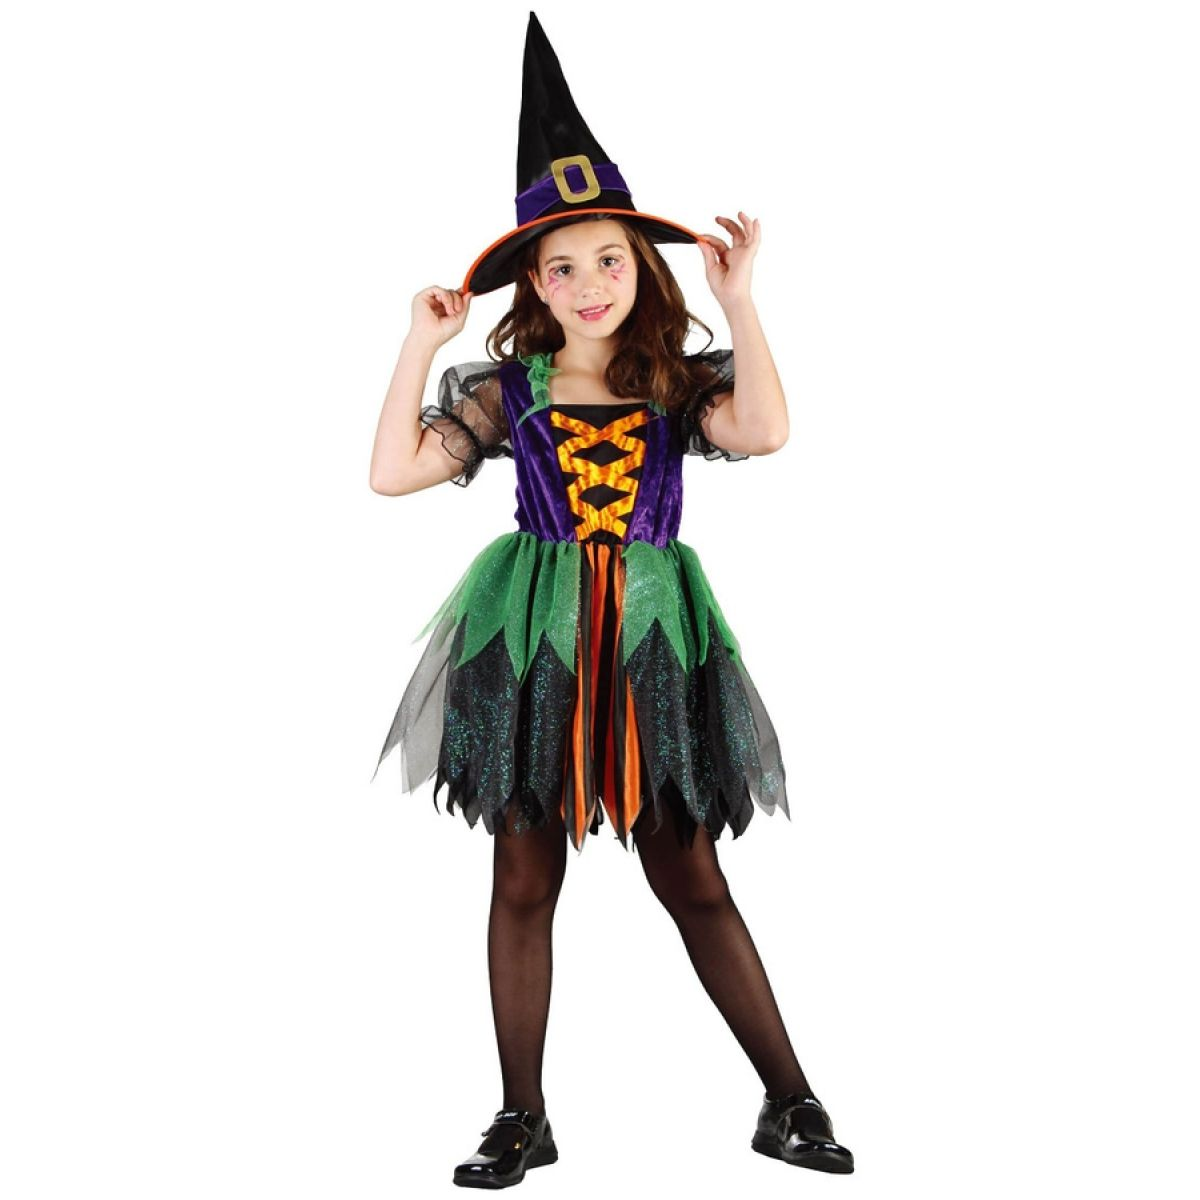 Made Dětský kostým čarodějka vel.S MaDe